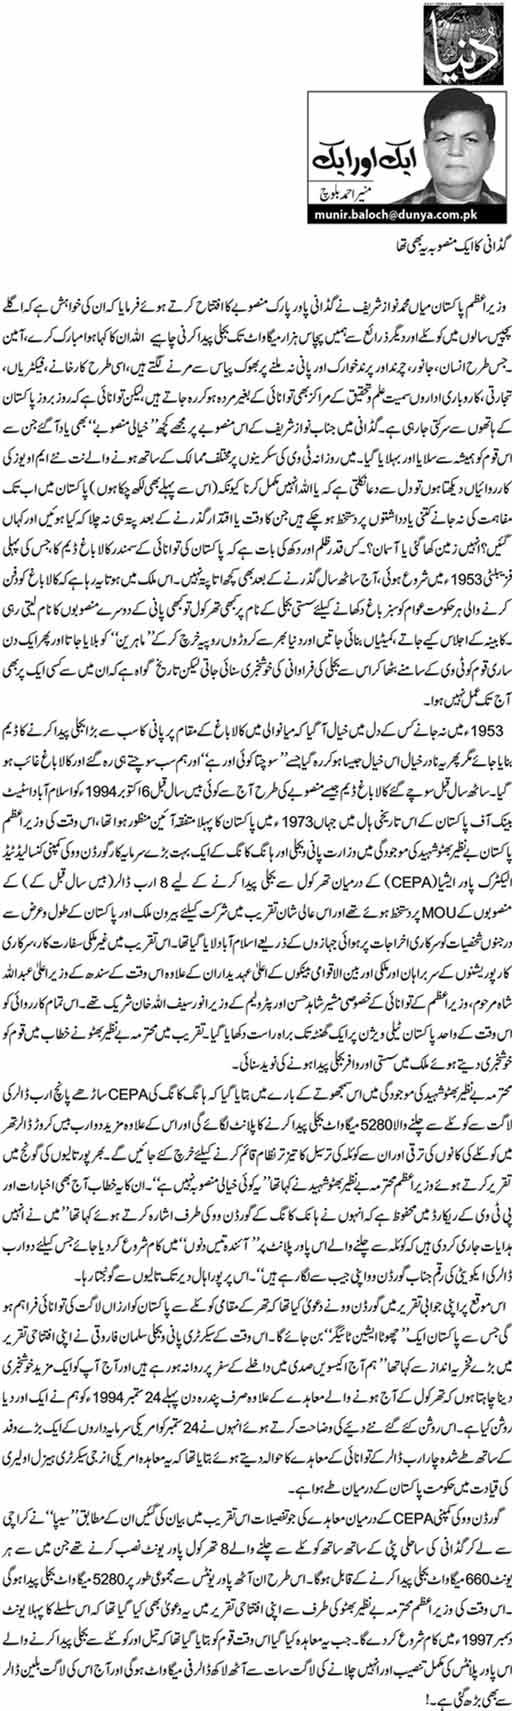 Gadani Ka Aik Mansooba Yeh Bhi Tha - Munir Ahmed Baloch